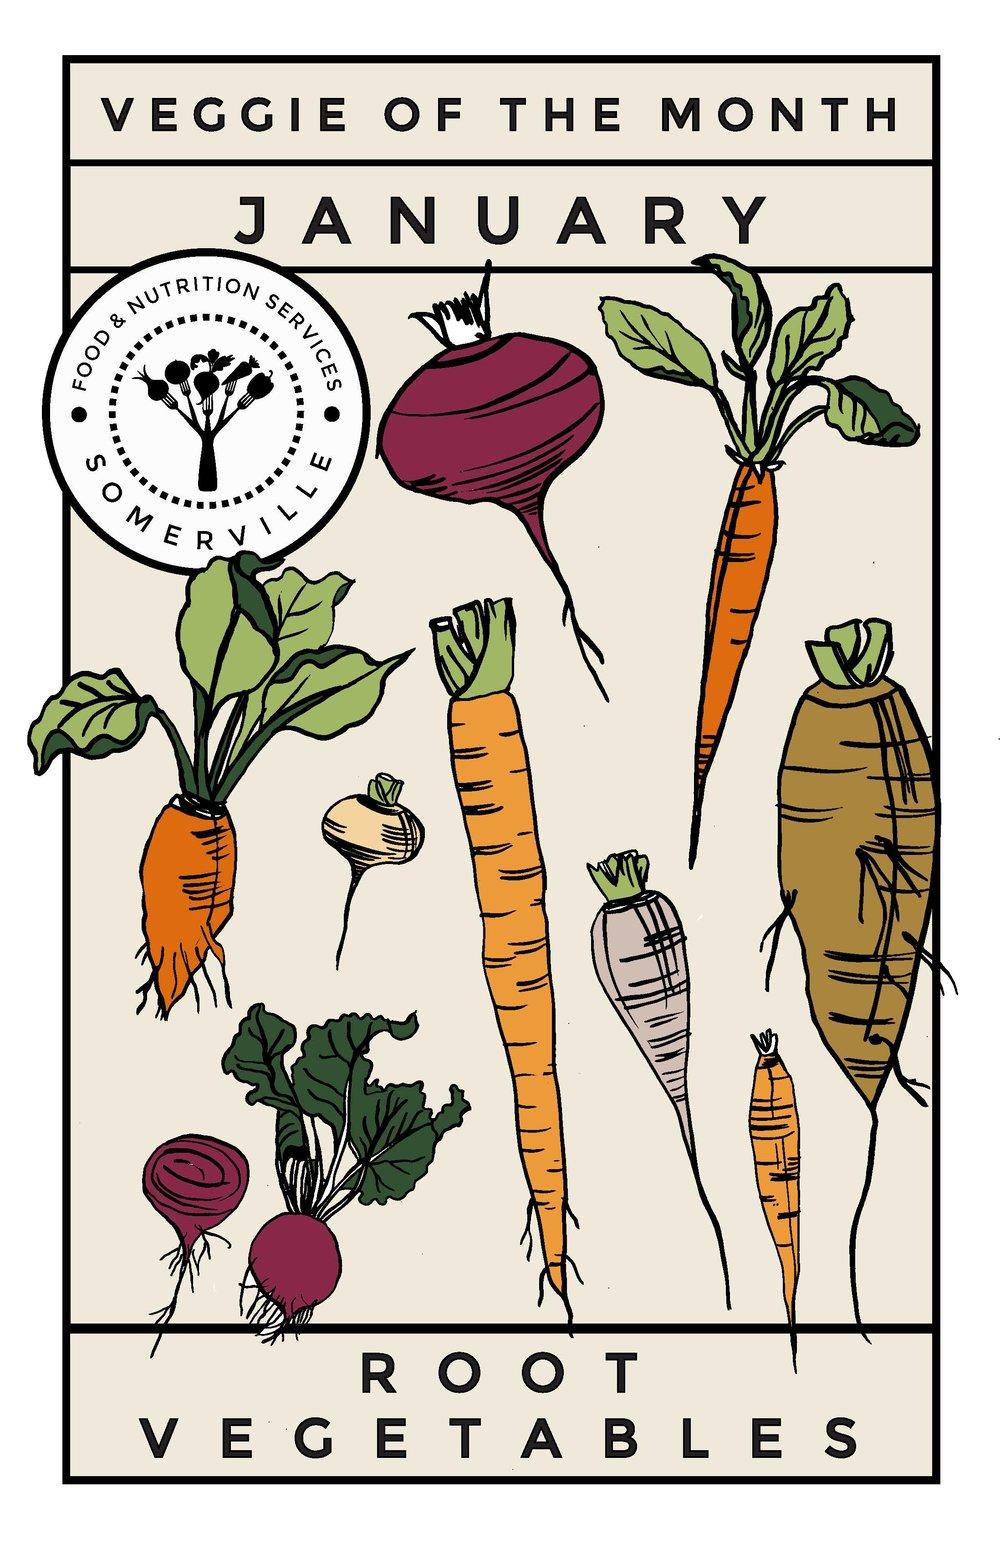 A Veggie a Month Poster Design